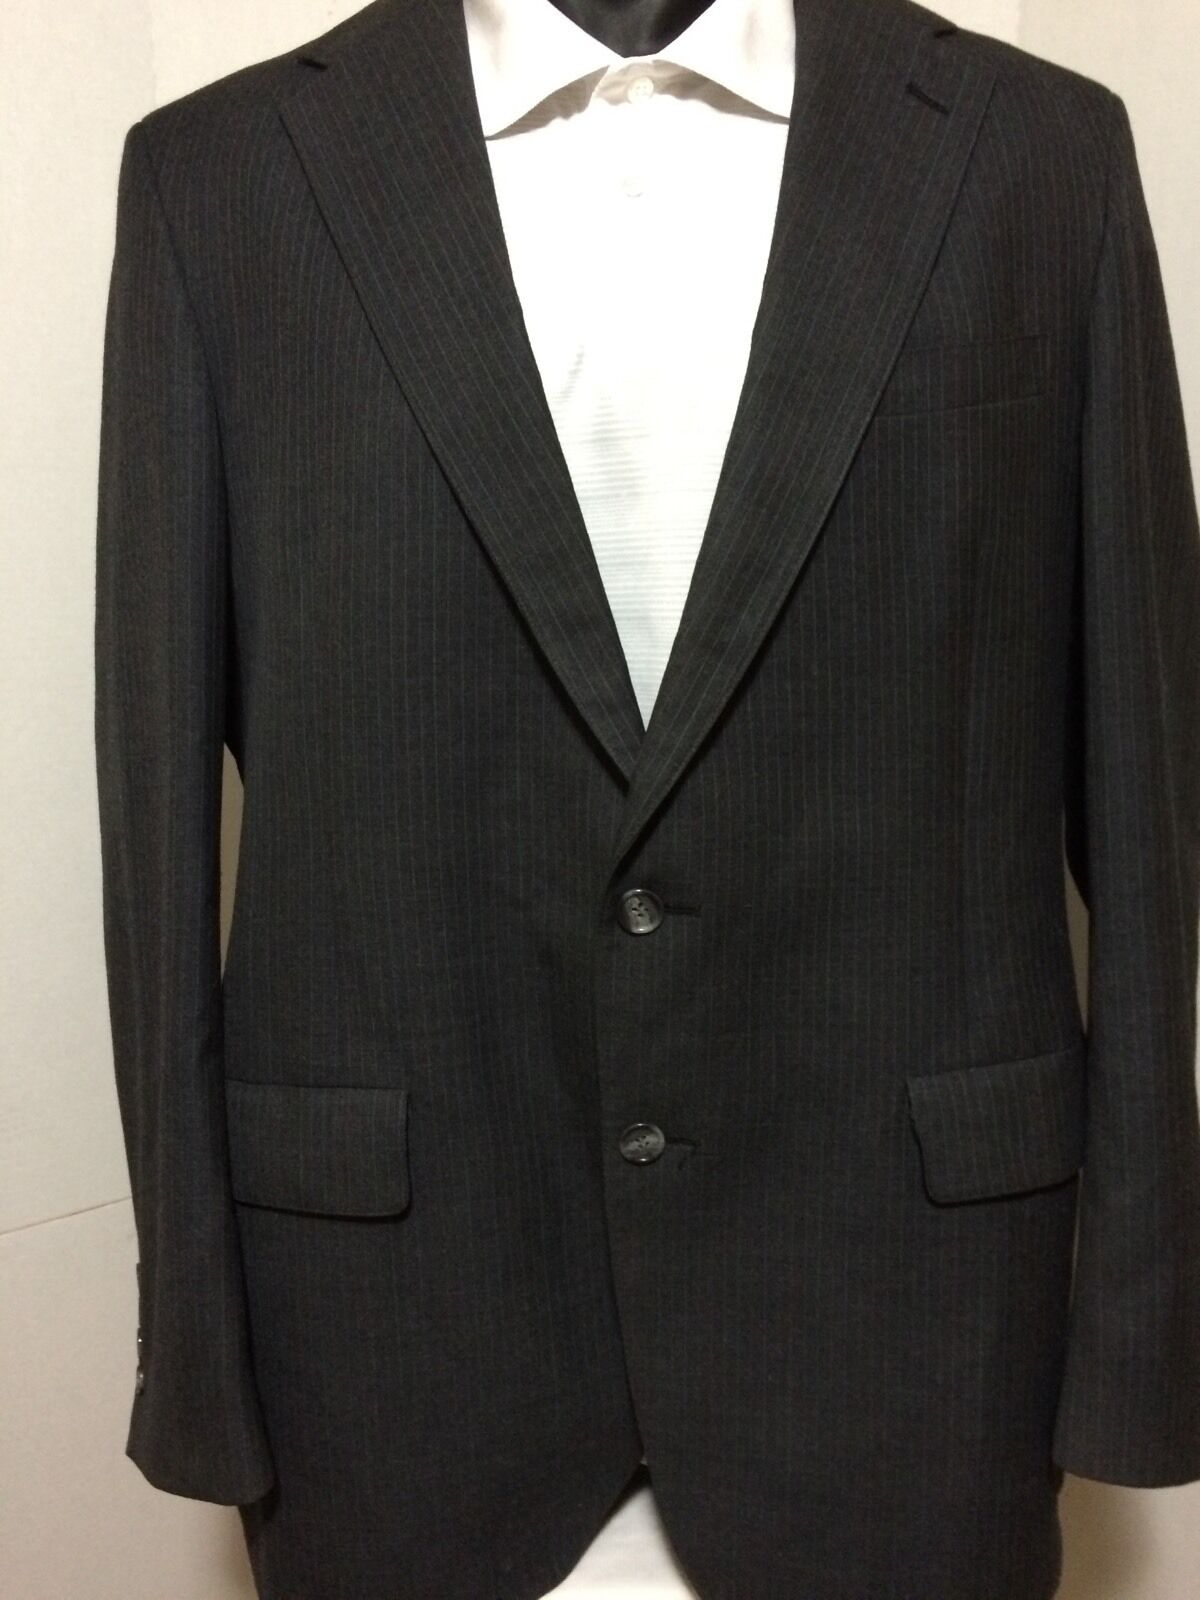 Palm Beach By Belk Dark grau Pinstripe Wool grau 2 Button Sport Coat Blazer 42L